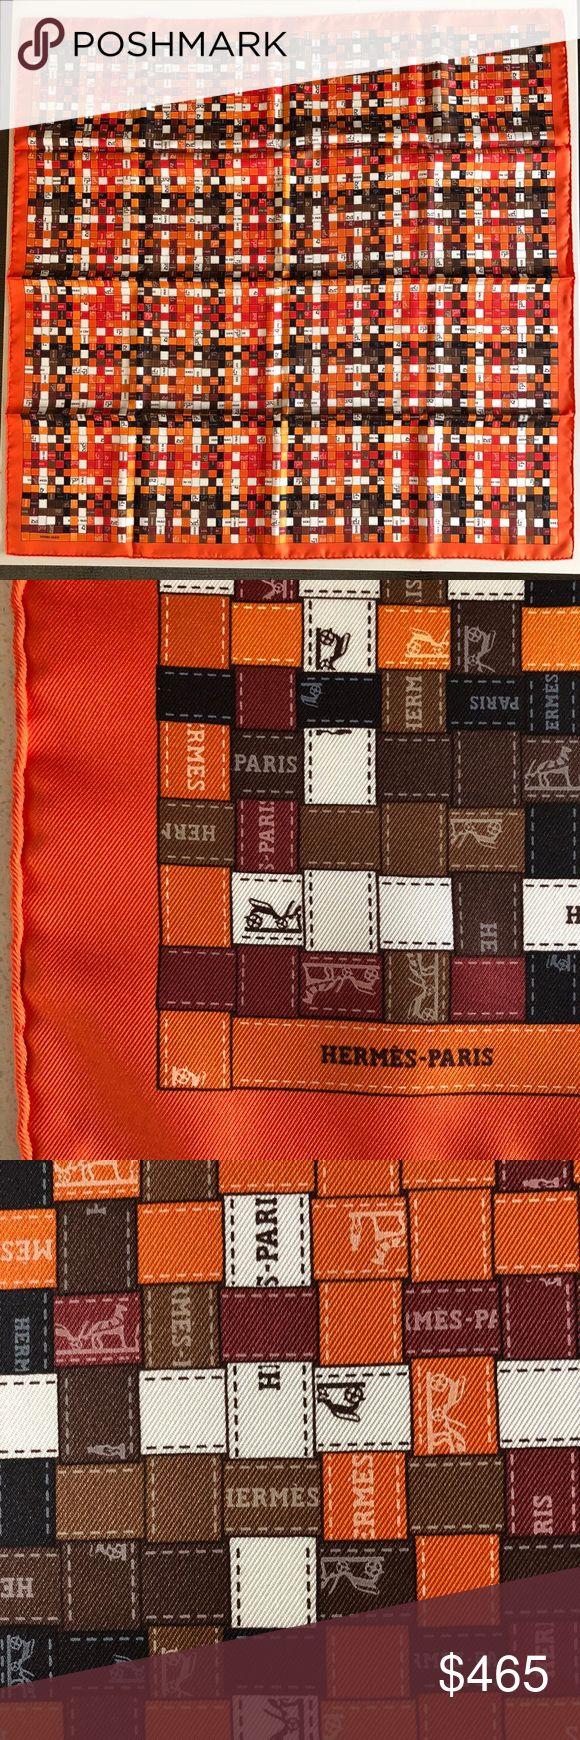 Hermès NWT Bolduc Au Carrè 100% silk scarf 36x36 Hermès NWT Bolduc Au Carrè 100% silk scarf 36x36 in the famous orange color.  Orange, brown, red, and black.  Versatile color to match just about everything.  NWT, no box, crisp silk. Hermes Accessories Scarves & Wraps